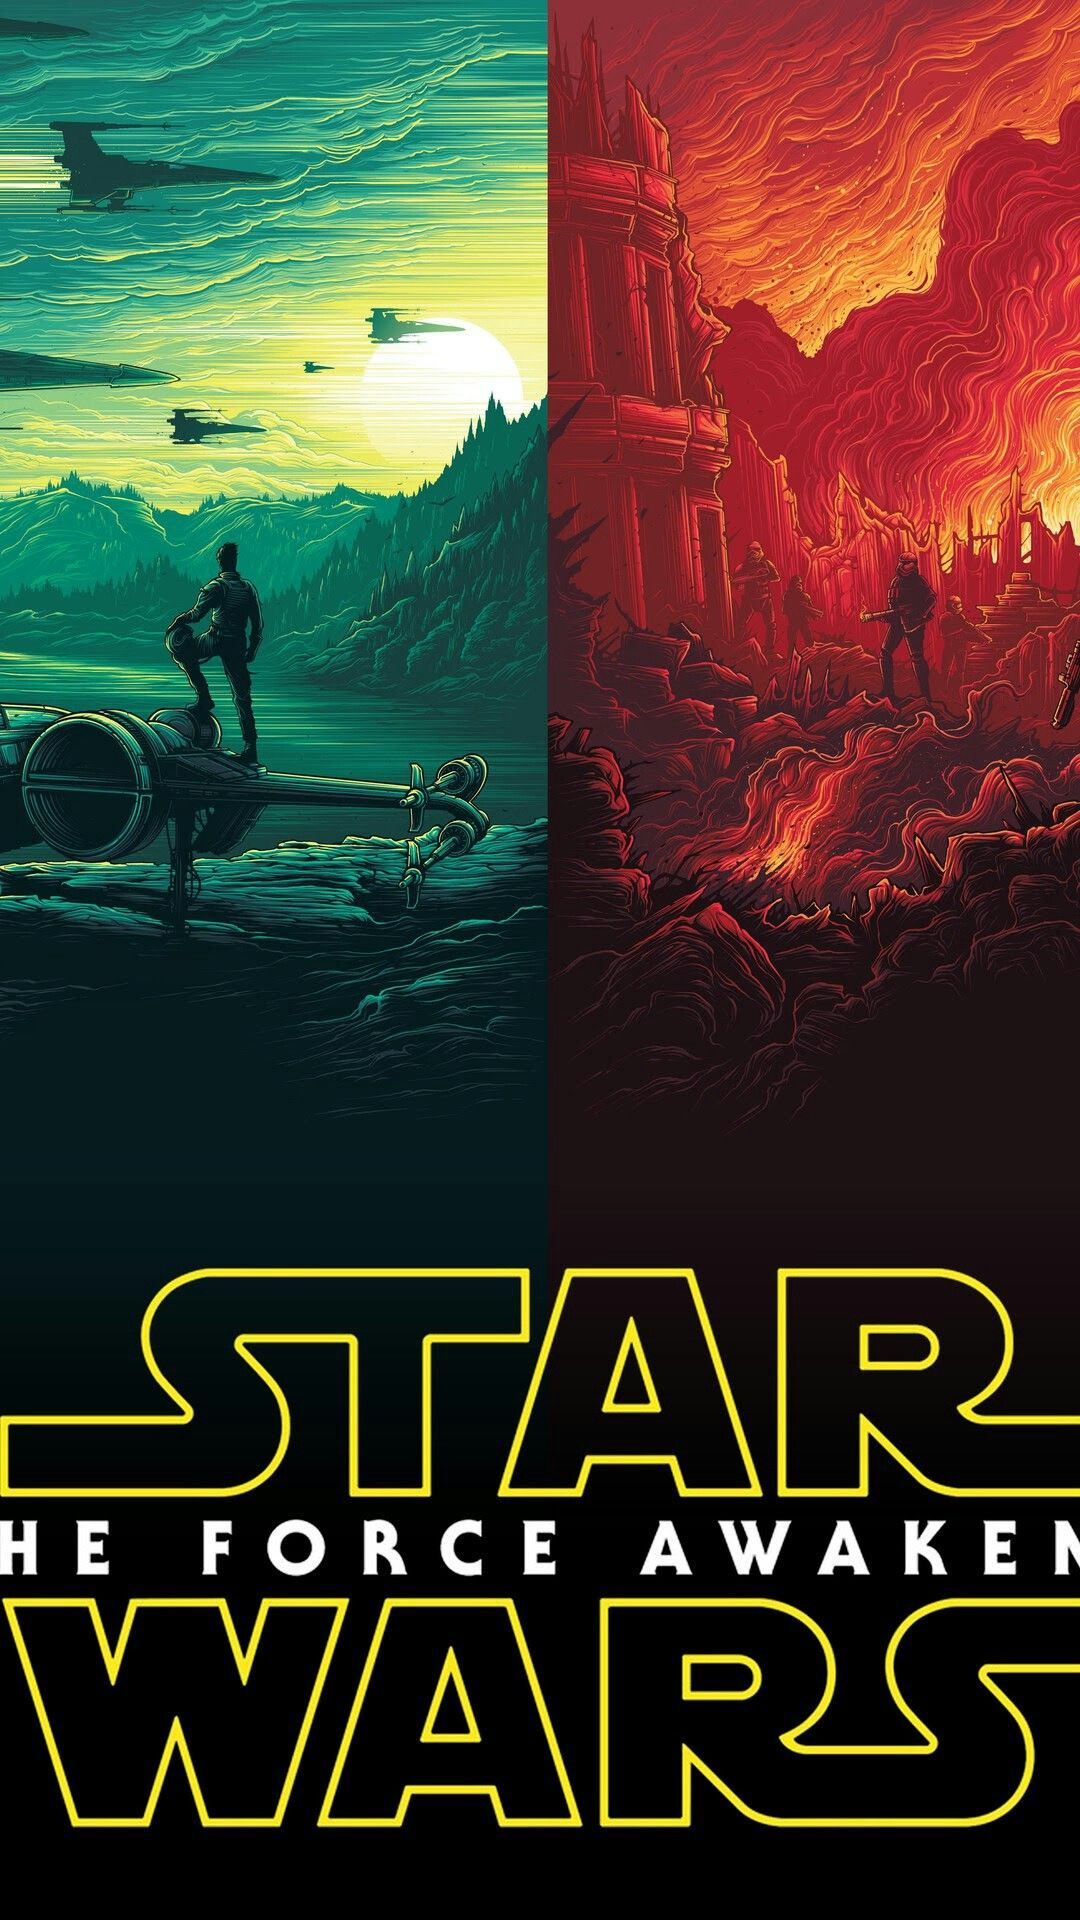 Pin by Randy Fang on Star Wars Star wars wallpaper iphone